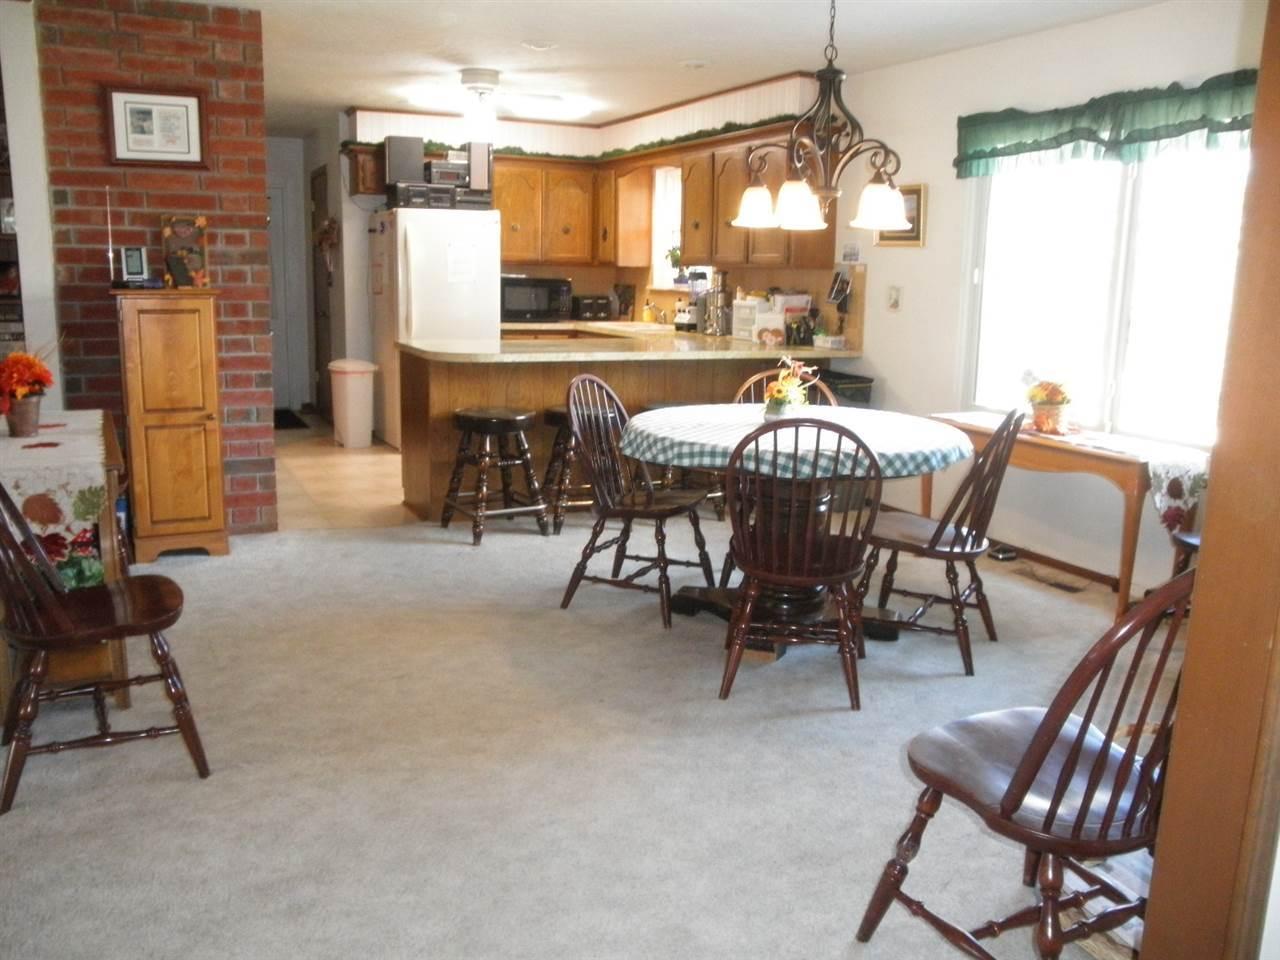 Sold Cross Sale W/ MLS | 1275 S Enterprise Road  Ponca City, OK 74604 5